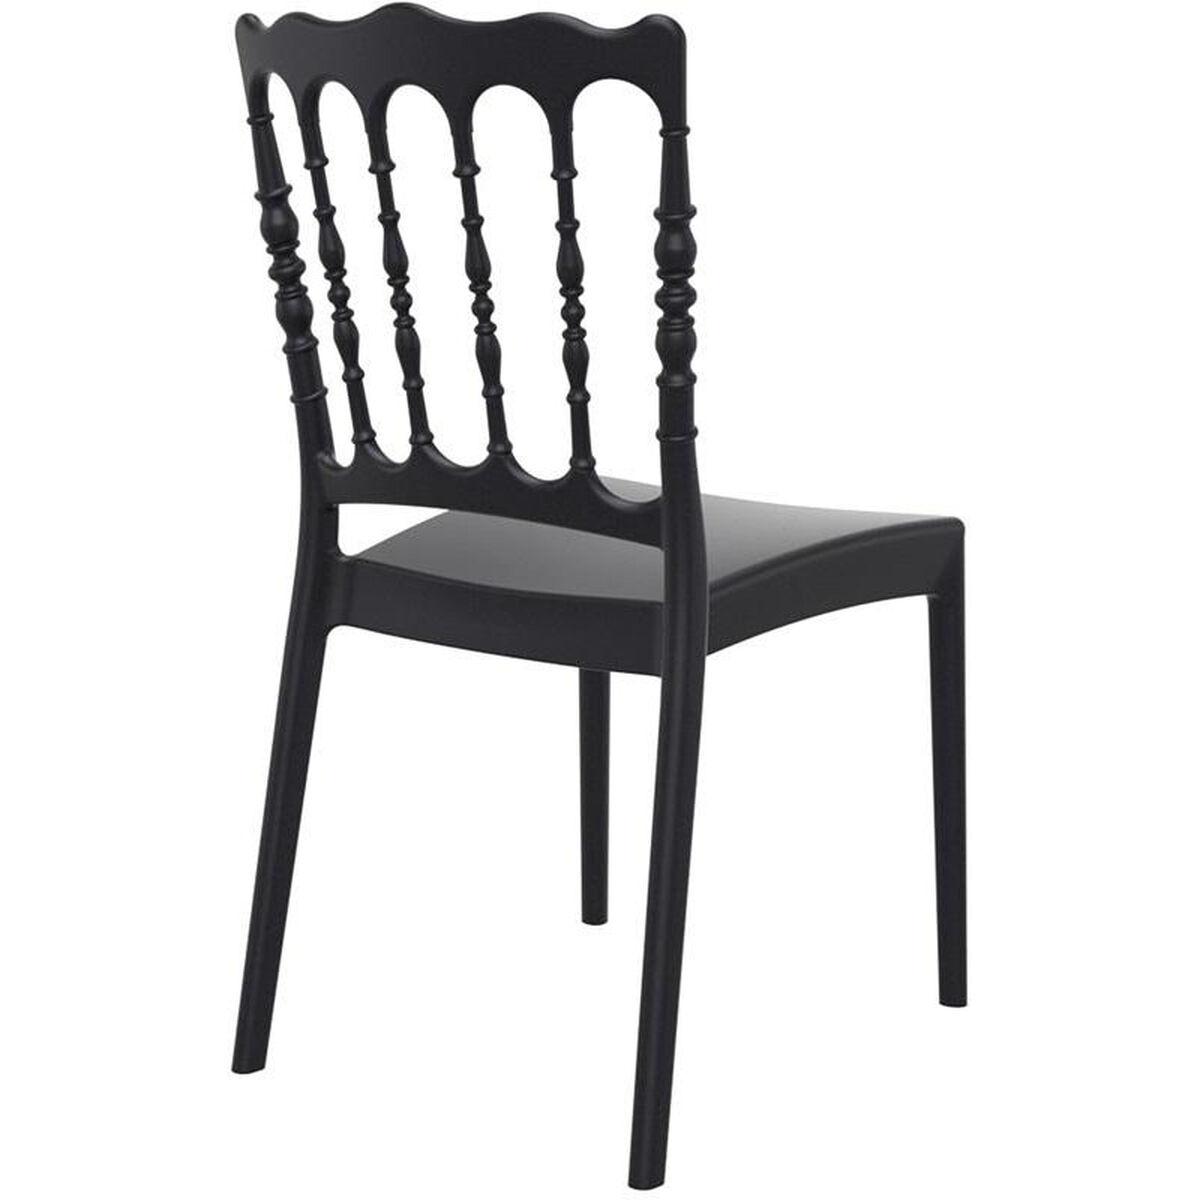 black stacking wedding chair isp044 bla. Black Bedroom Furniture Sets. Home Design Ideas